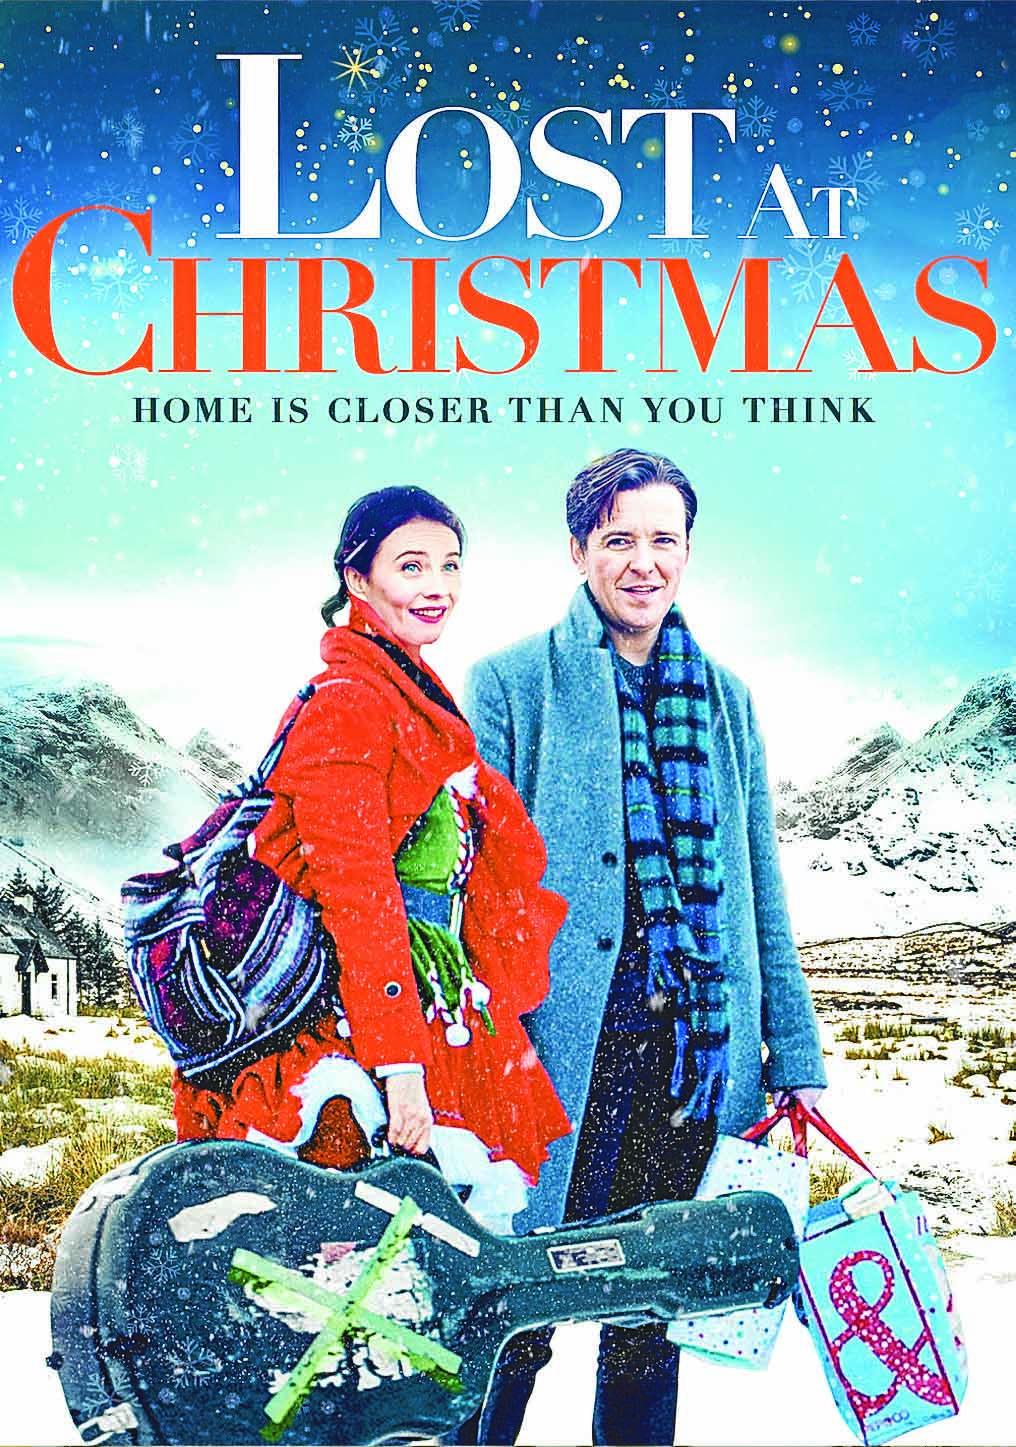 Festive film